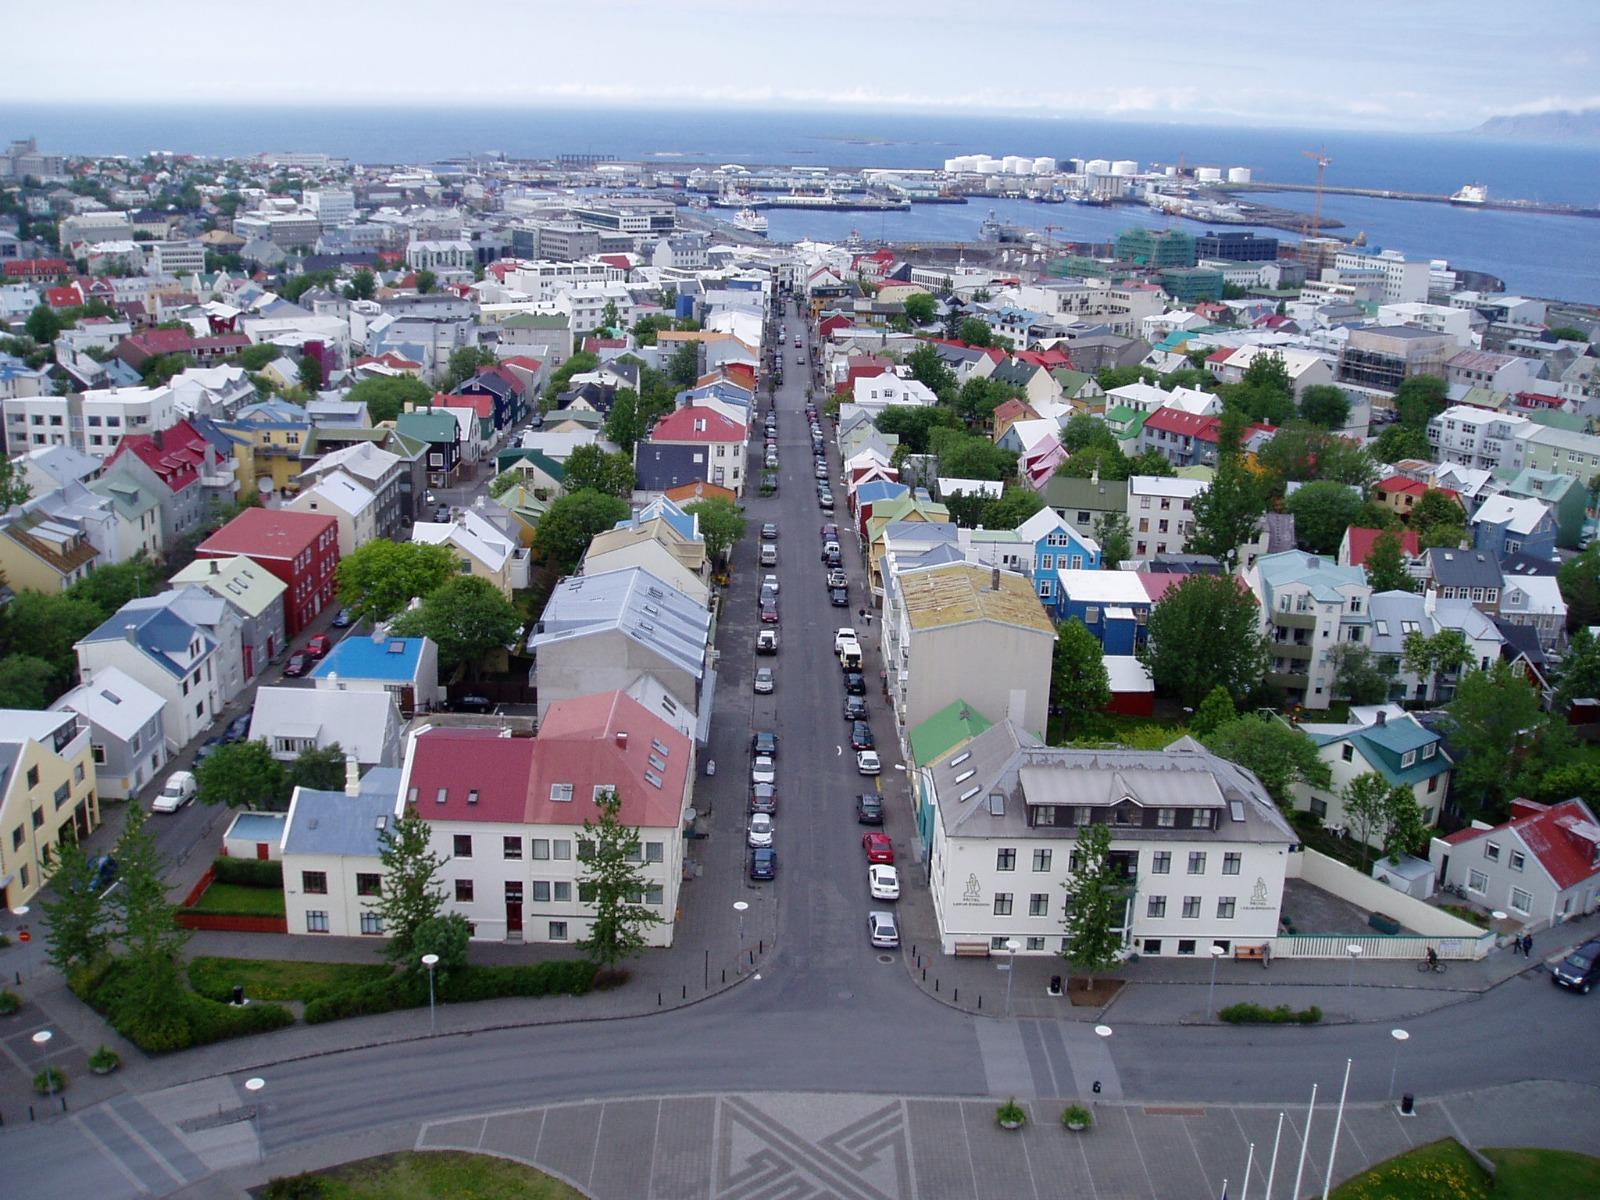 islanda02-1614868728.jpg